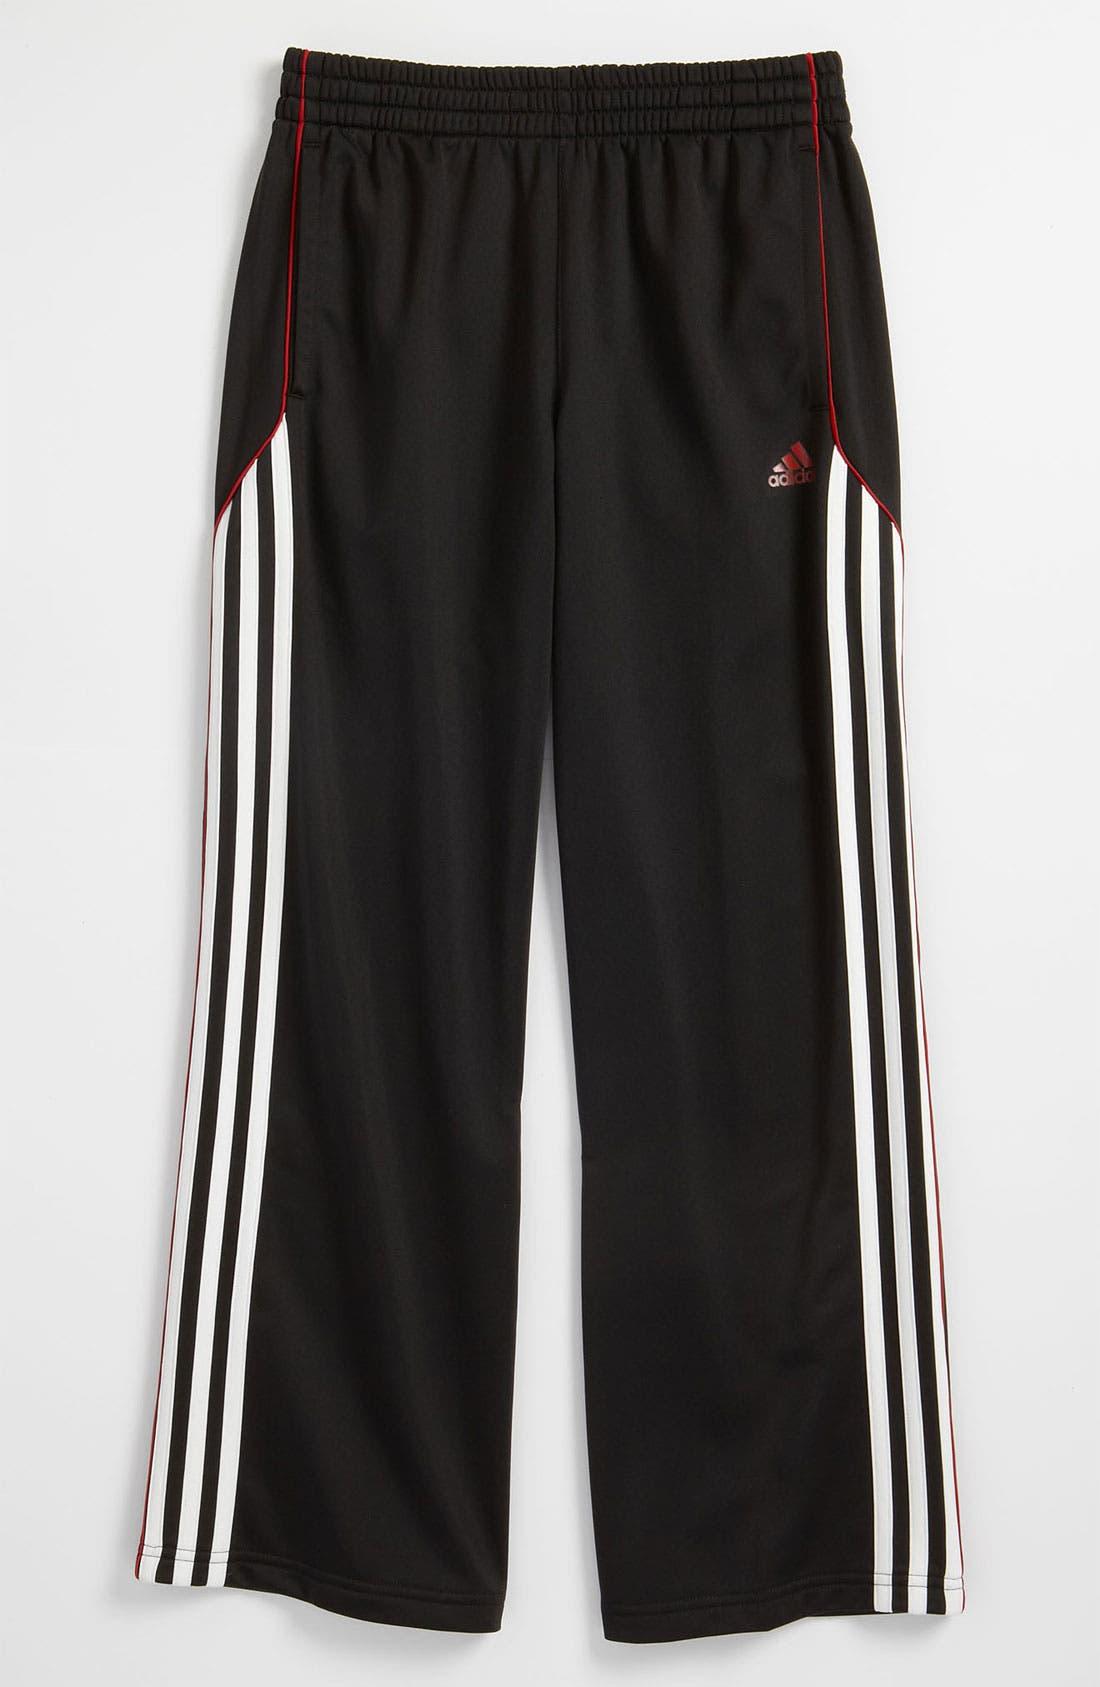 Alternate Image 1 Selected - adidas Tricot Pants (Big Boys)